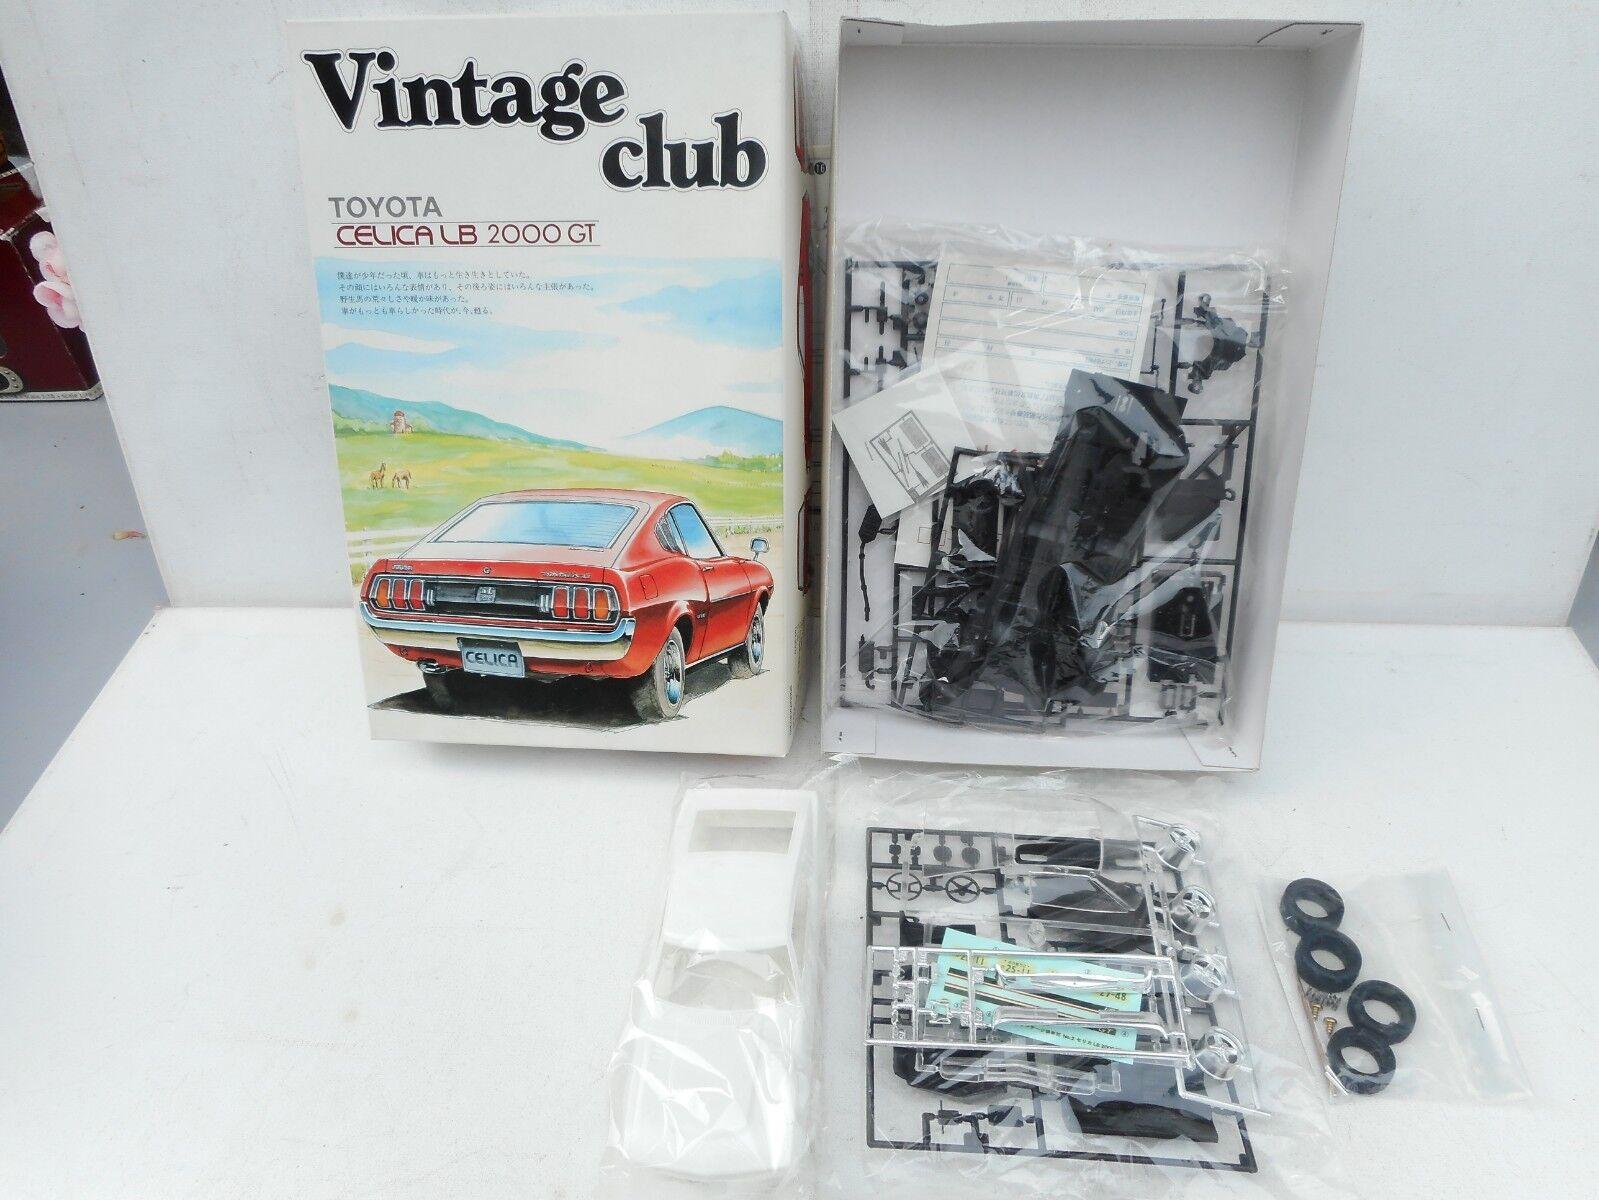 Aoshima Vintage club  KIT  1/24 Celica LB 2000 GT Vintage Club RARE SELTEN